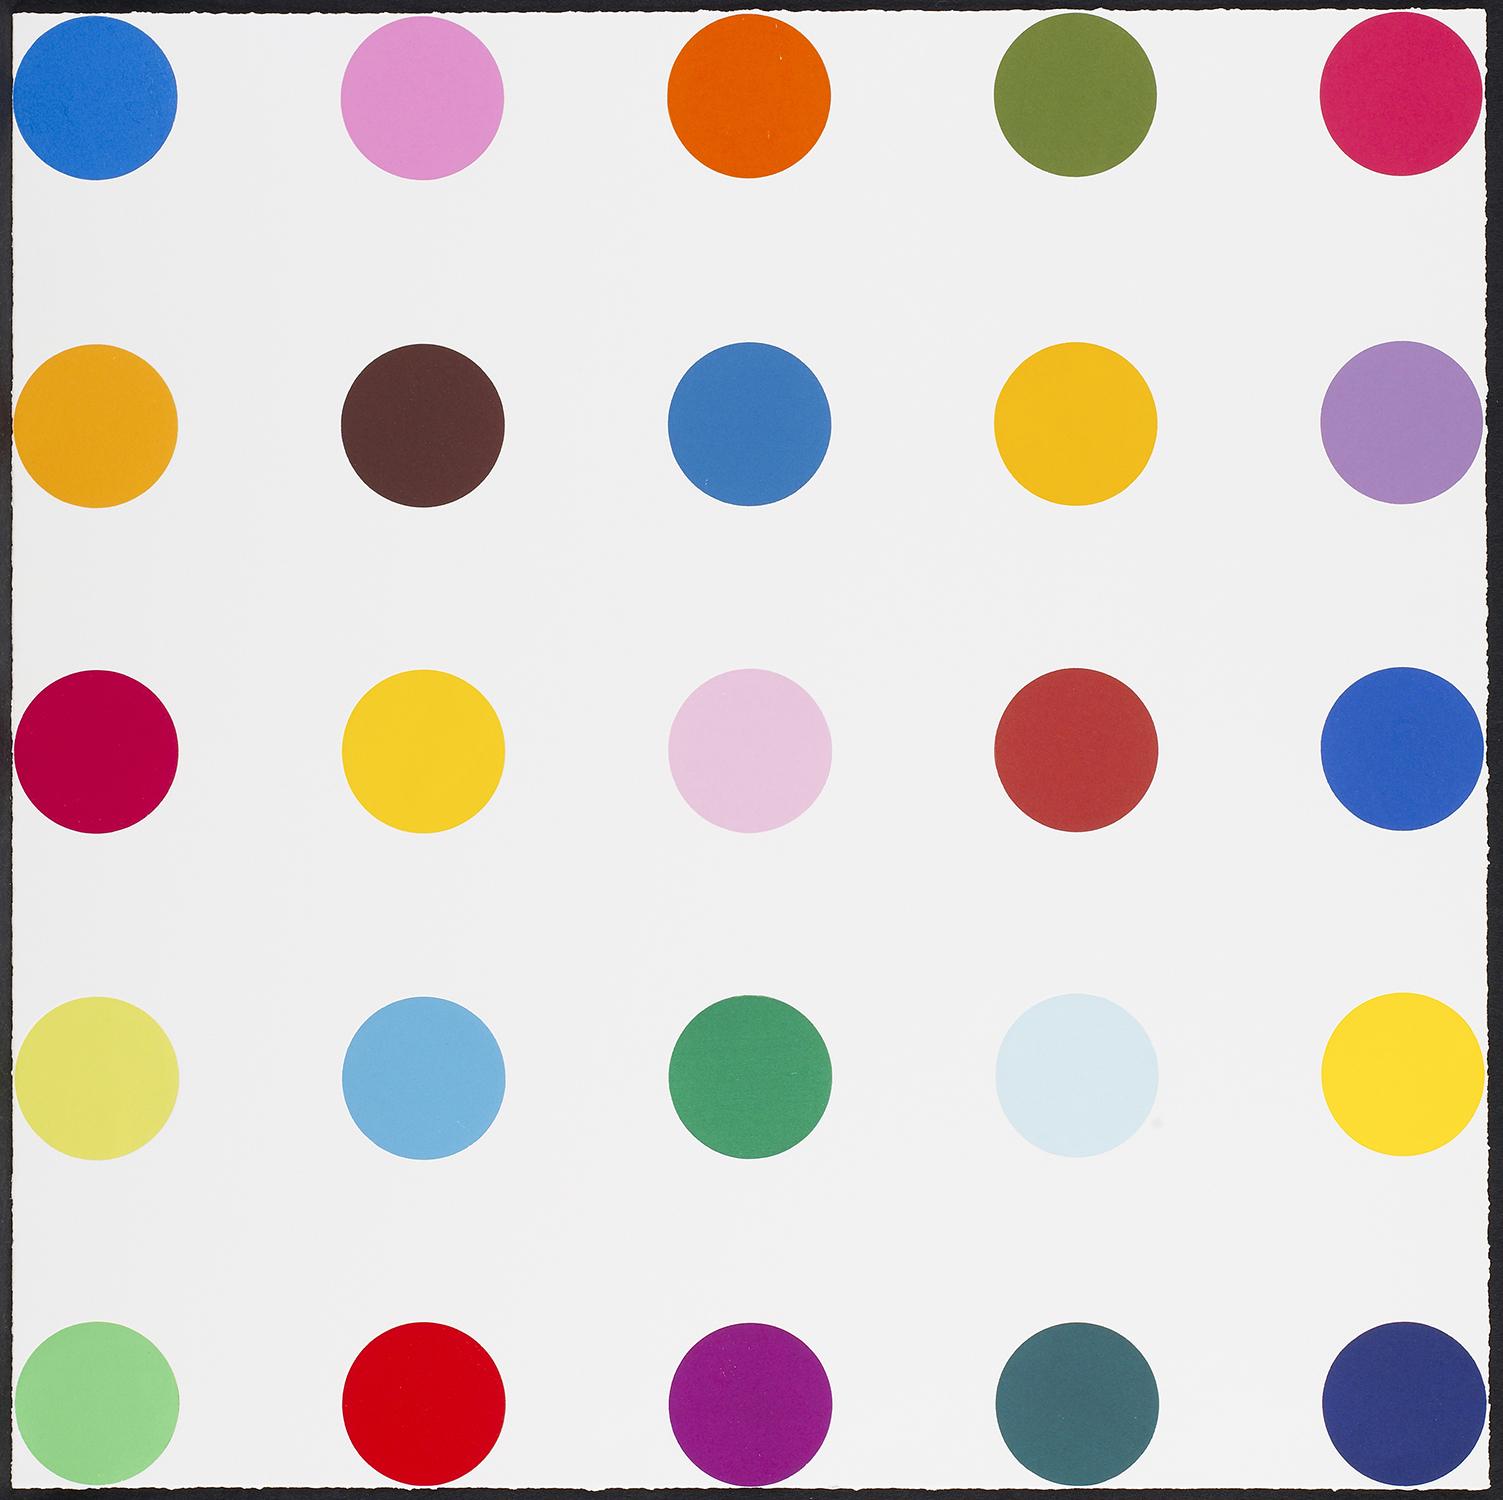 Damien Hirst  Bromobenzotrifluoride • 2010 Xilogravura   Edição: 48   91.4 x 91.4 cm